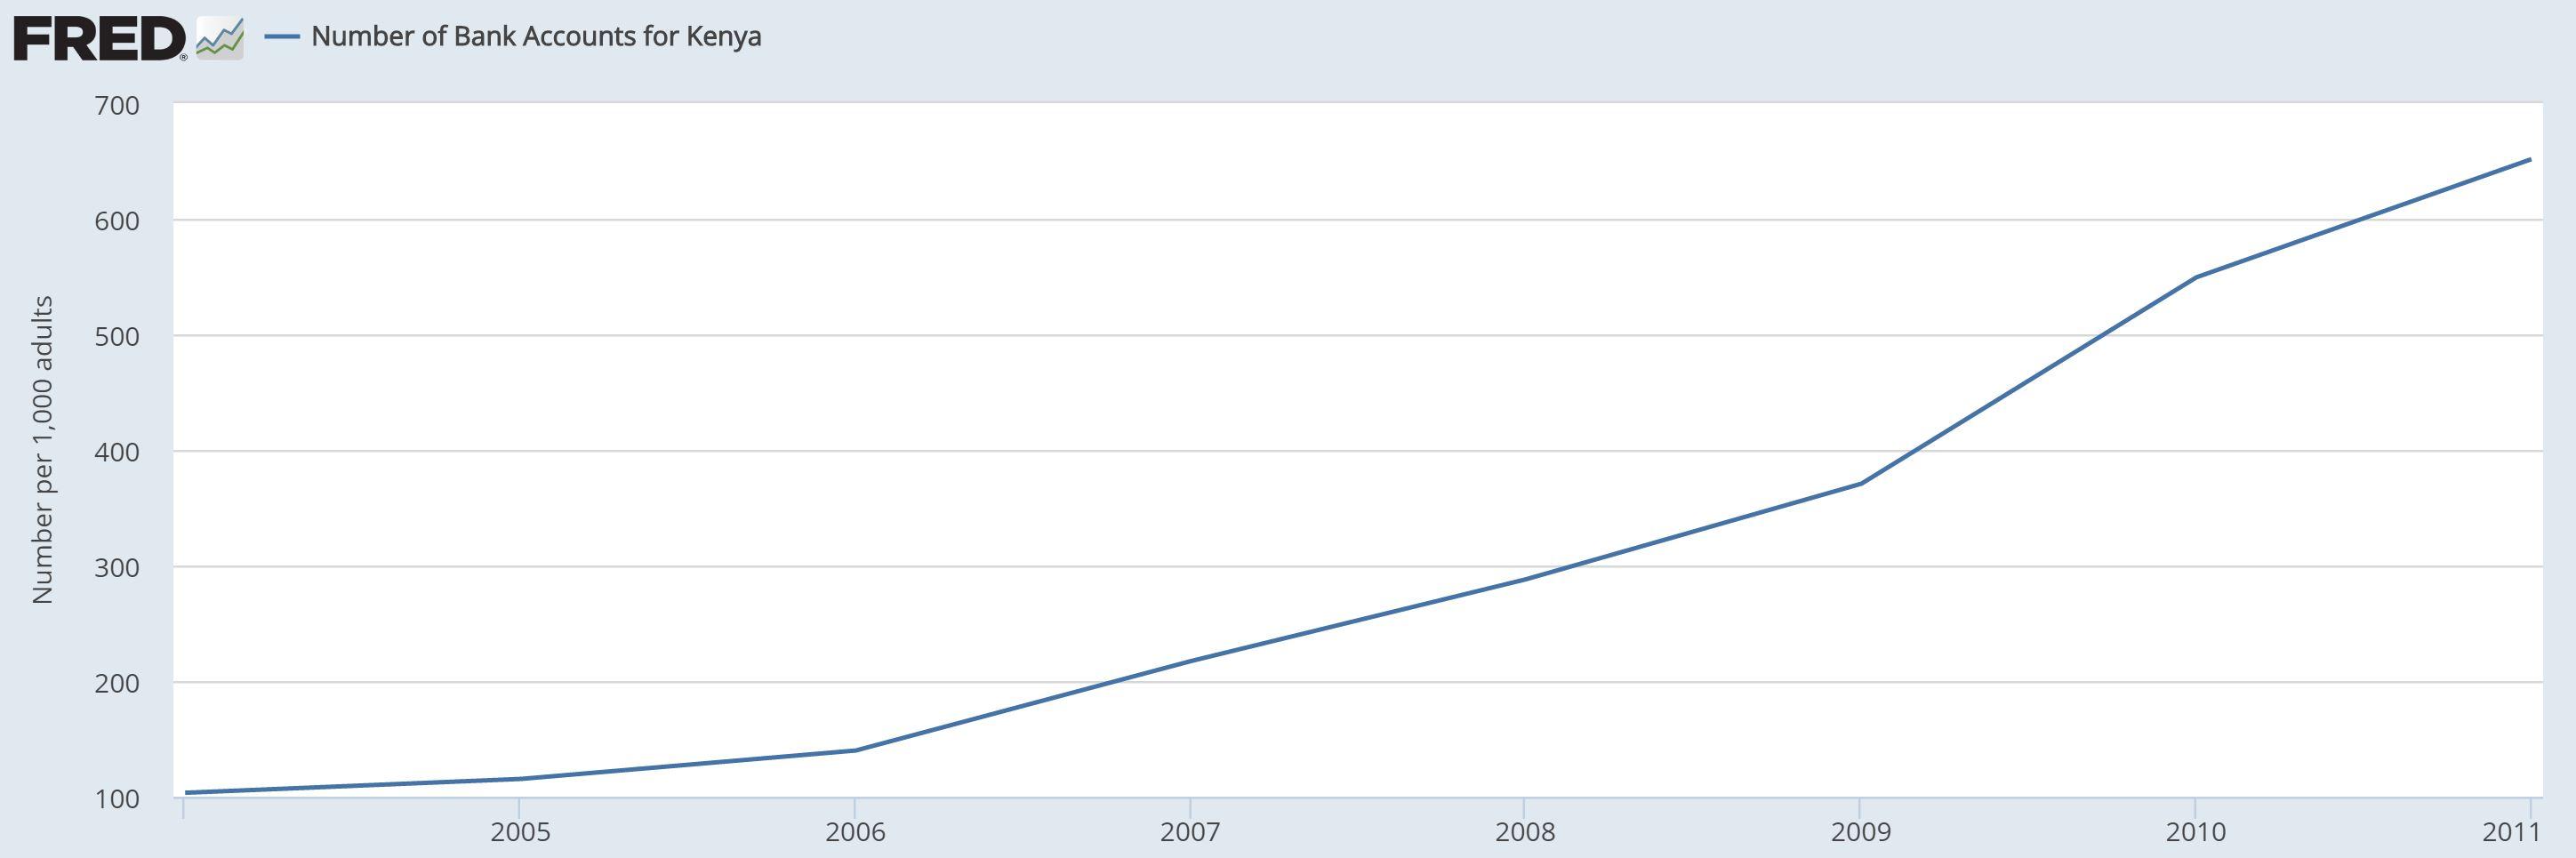 Penetration of bank accounts in Kenya 2005-2011